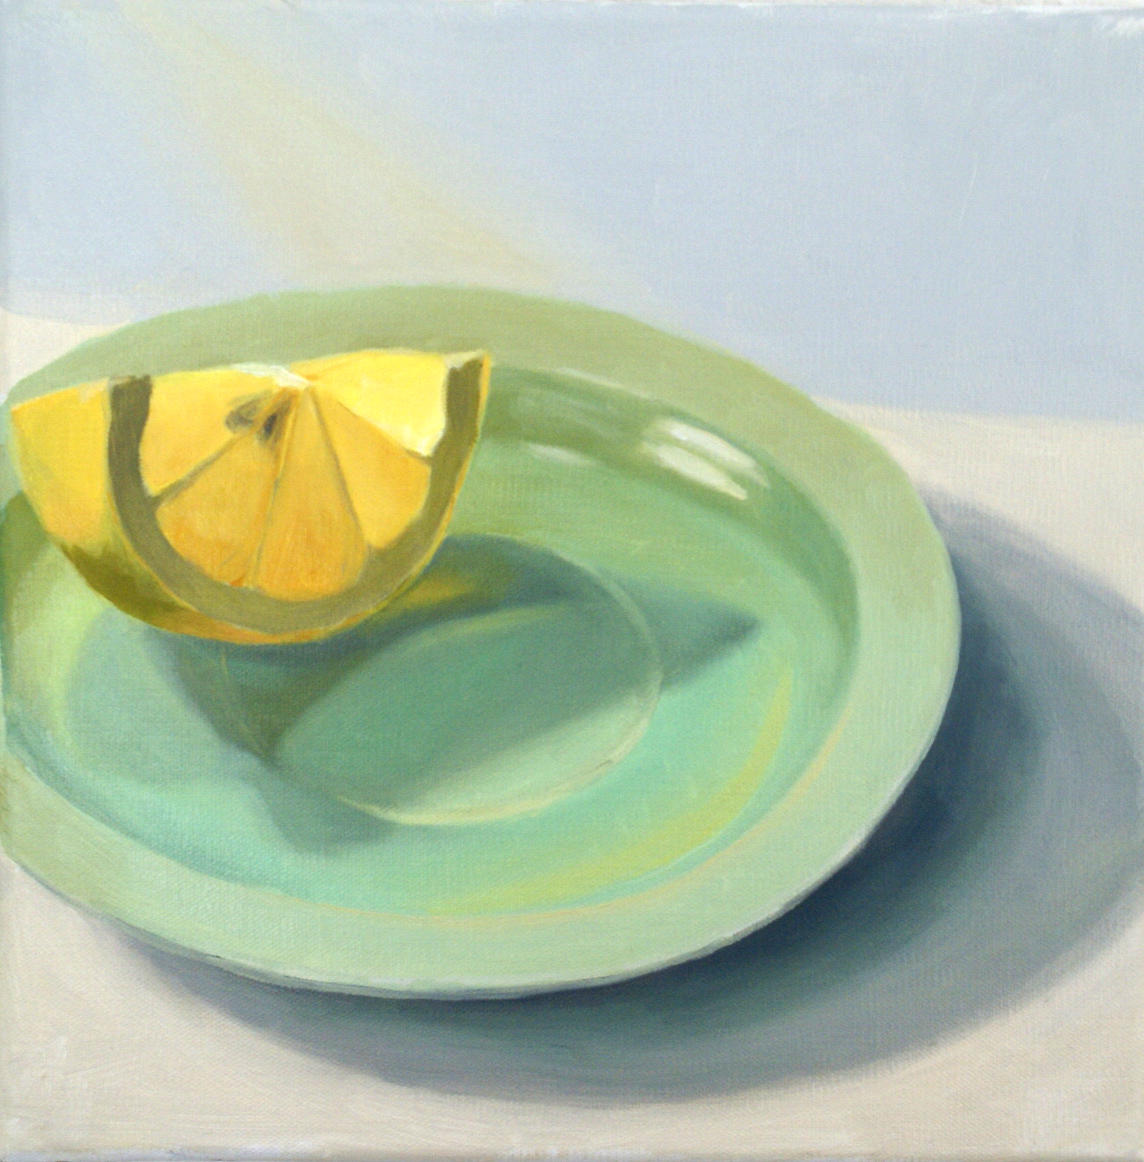 Oil painting of a lemon